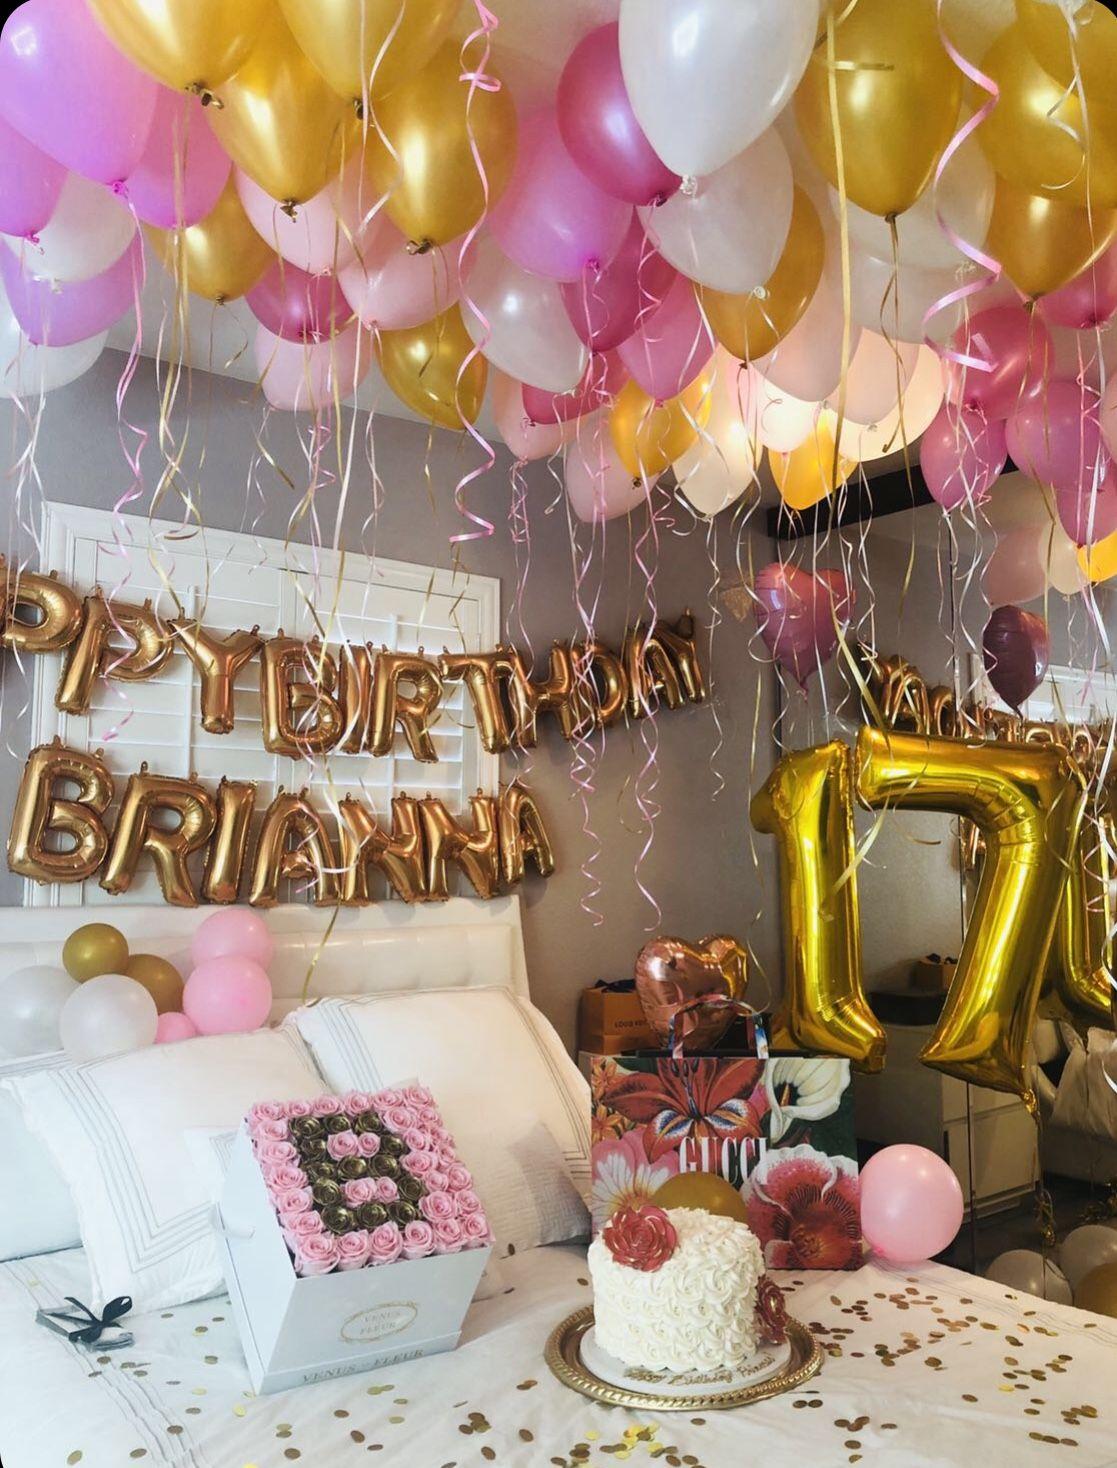 46+ Happy birthday room decoration ideas in 2021